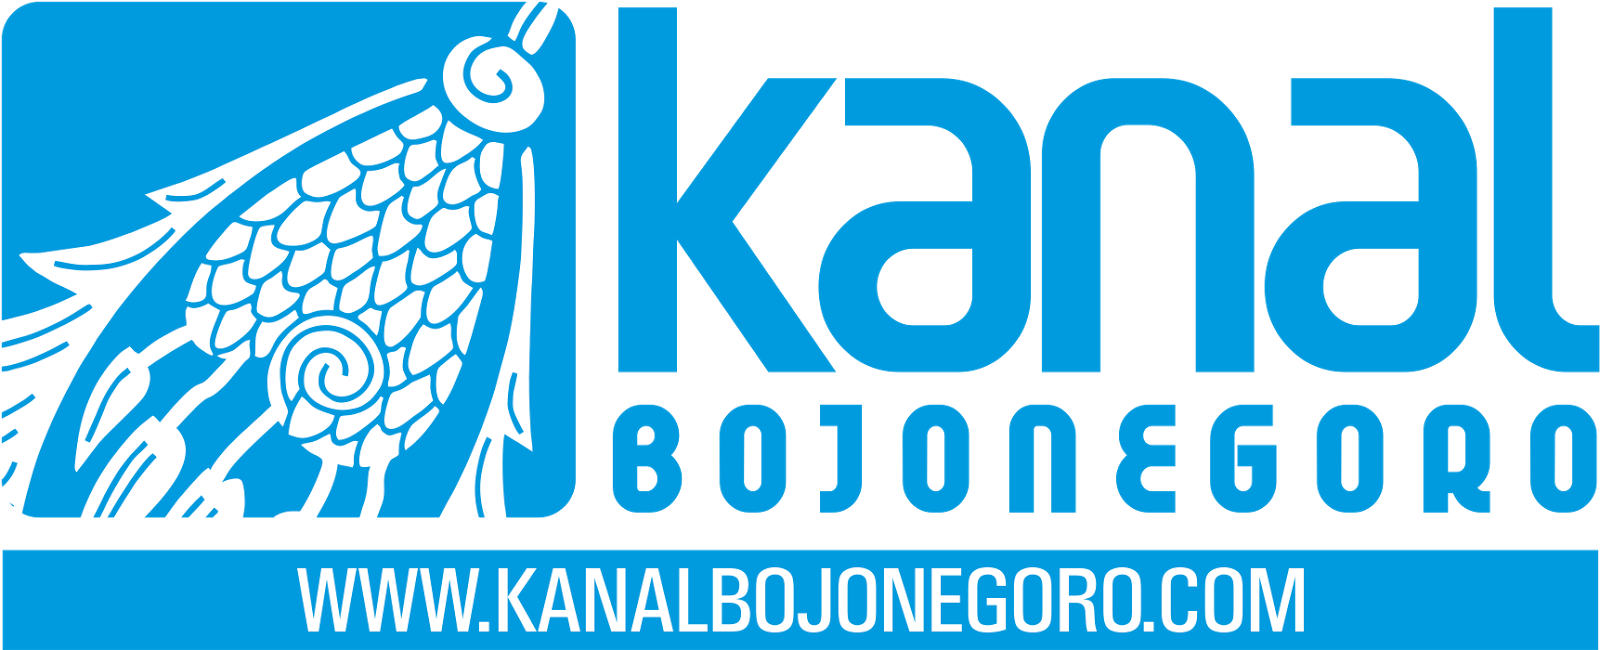 KANAL BOJONEGORO